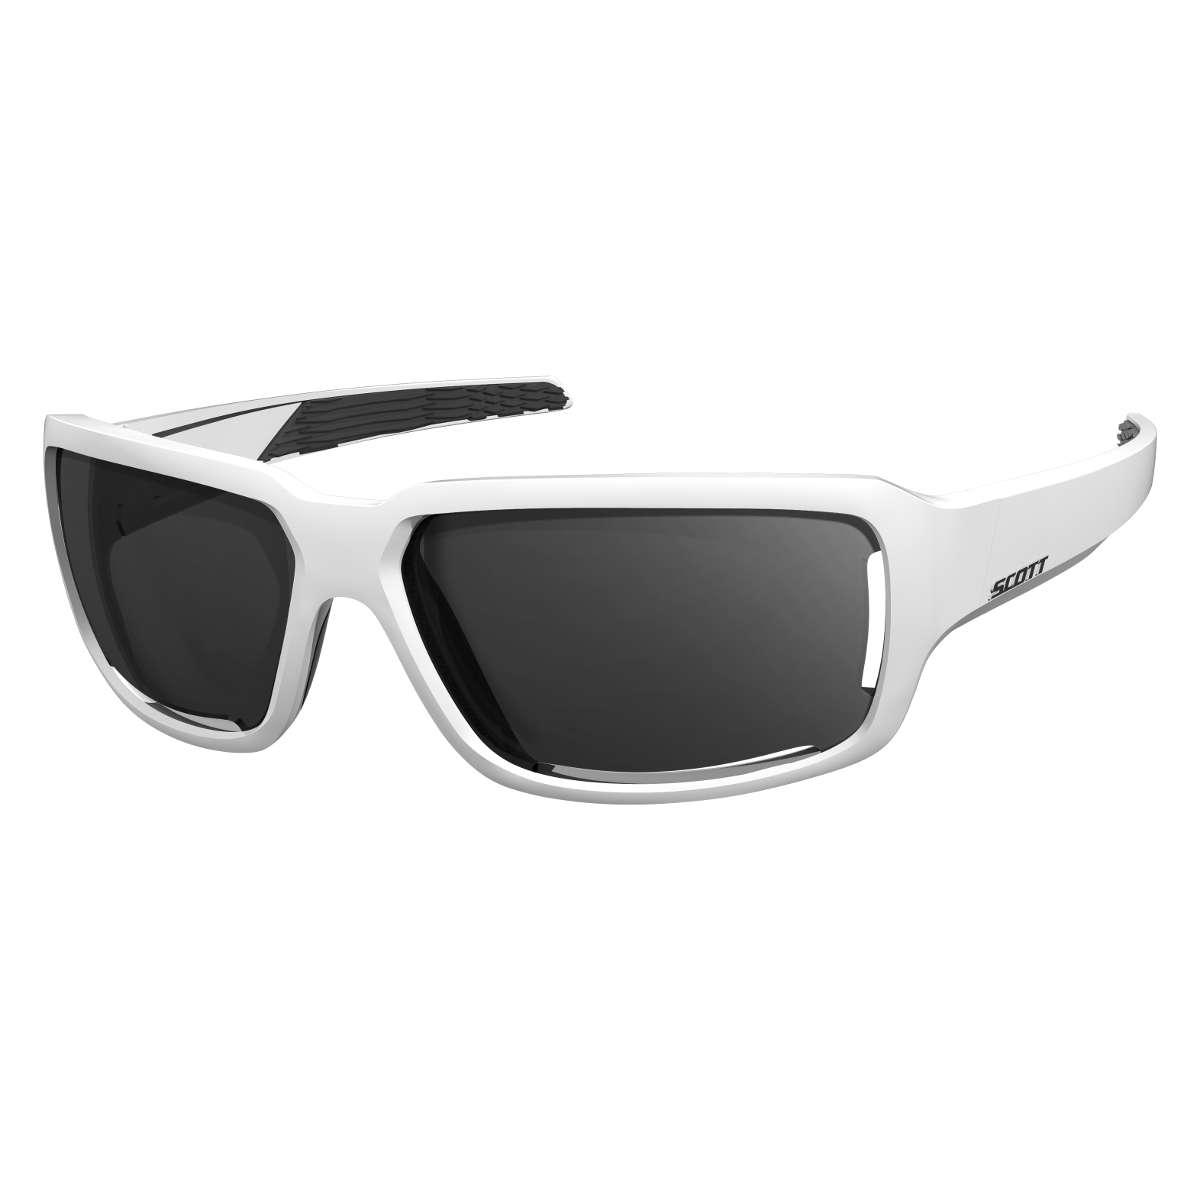 Scott Sonnenbrille Obsess ACS Weiß gZZBnNGrio